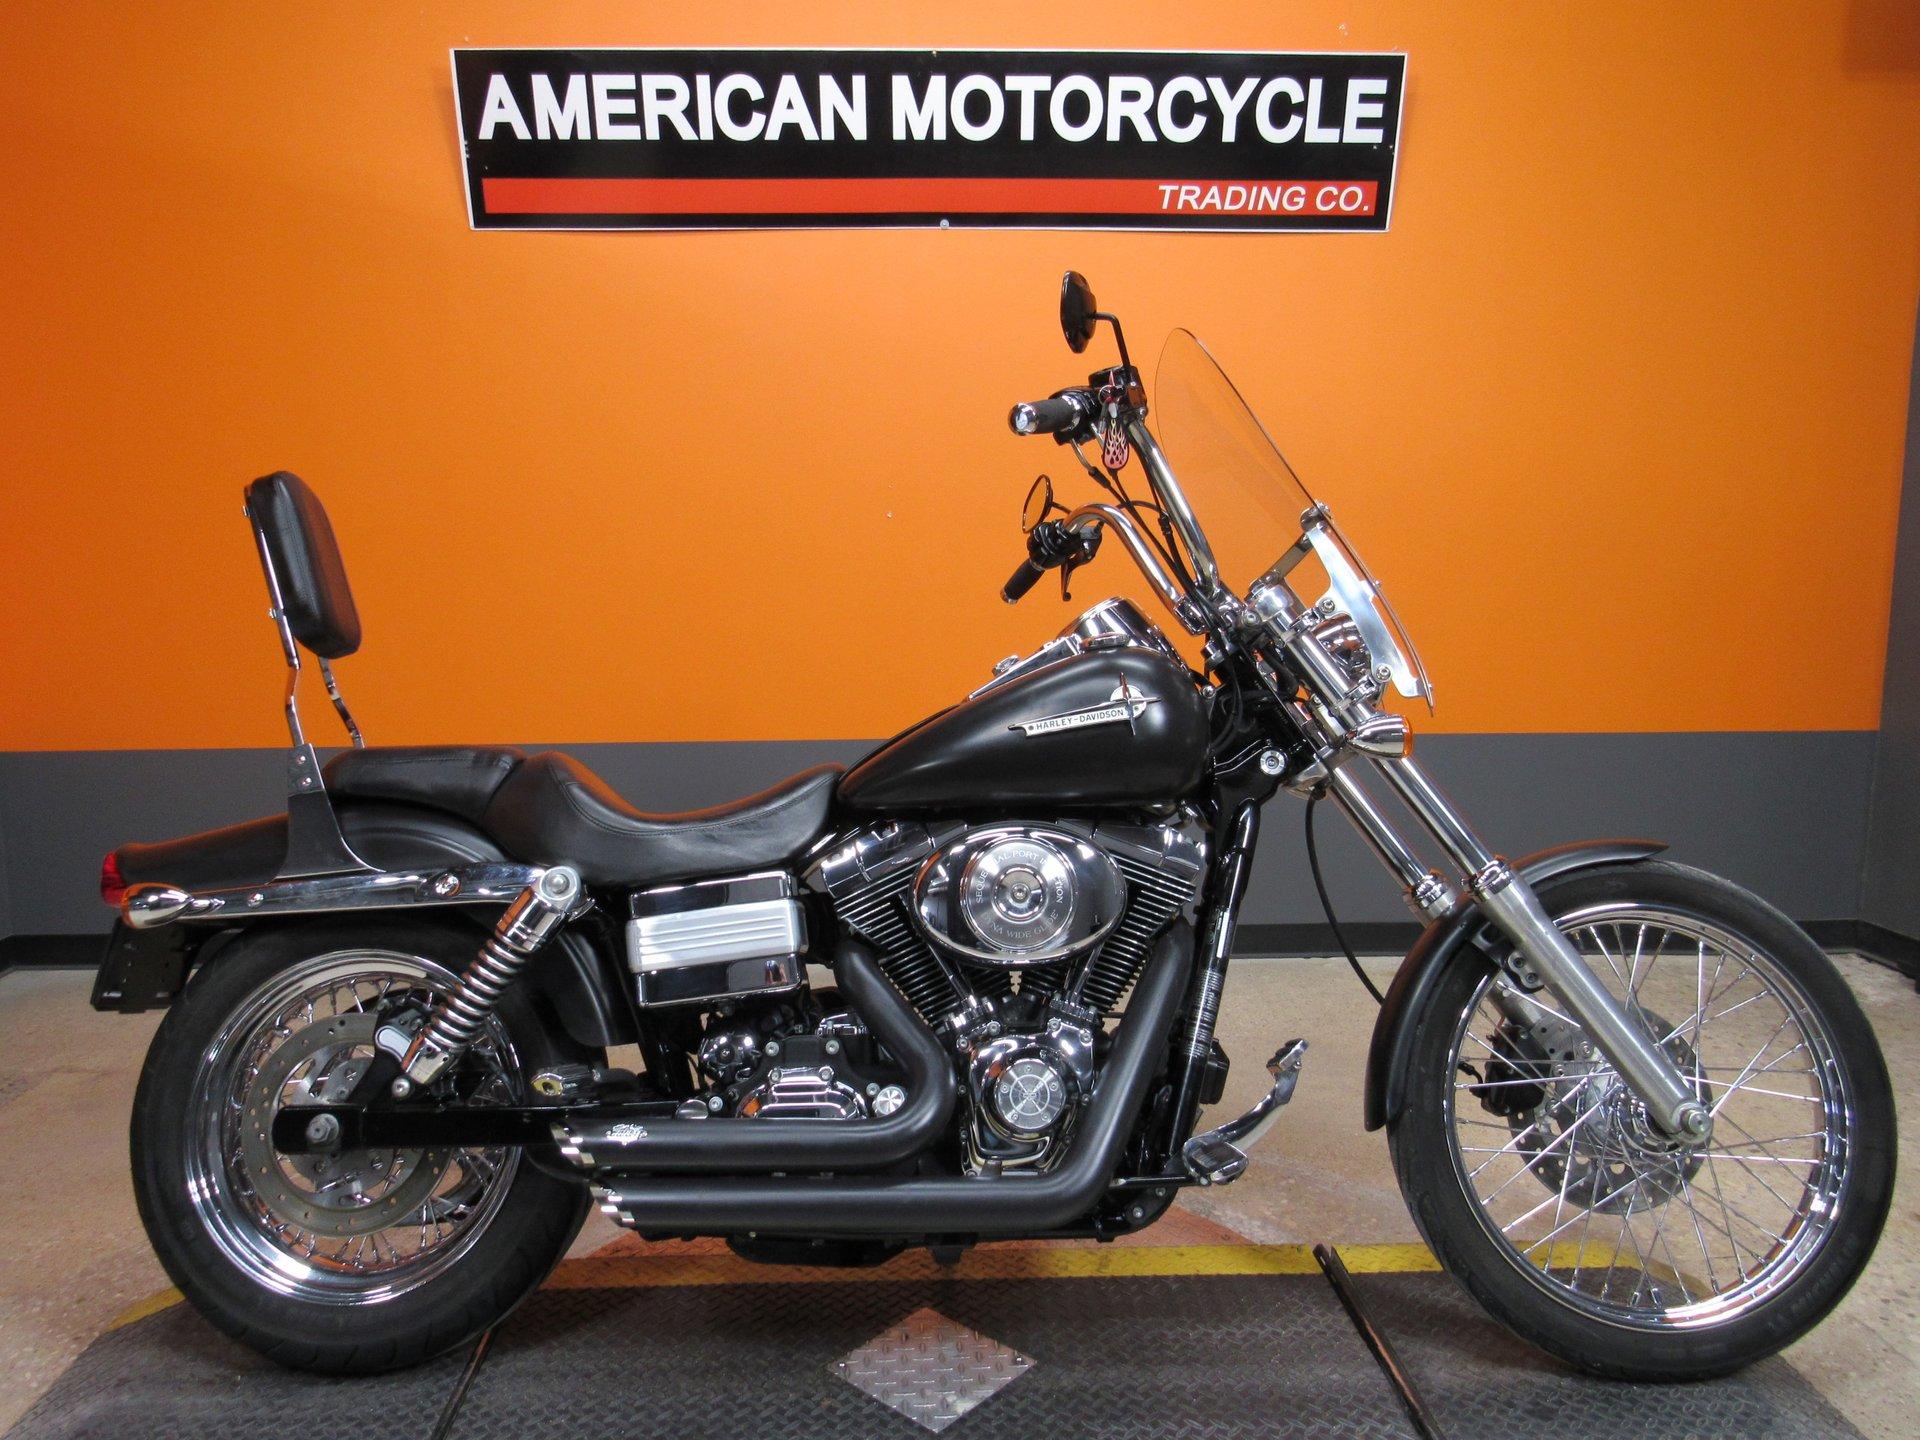 2006 Harley Davidson Dyna Wide Glide American Motorcycle Trading Company Used Harley Davidson Motorcycles